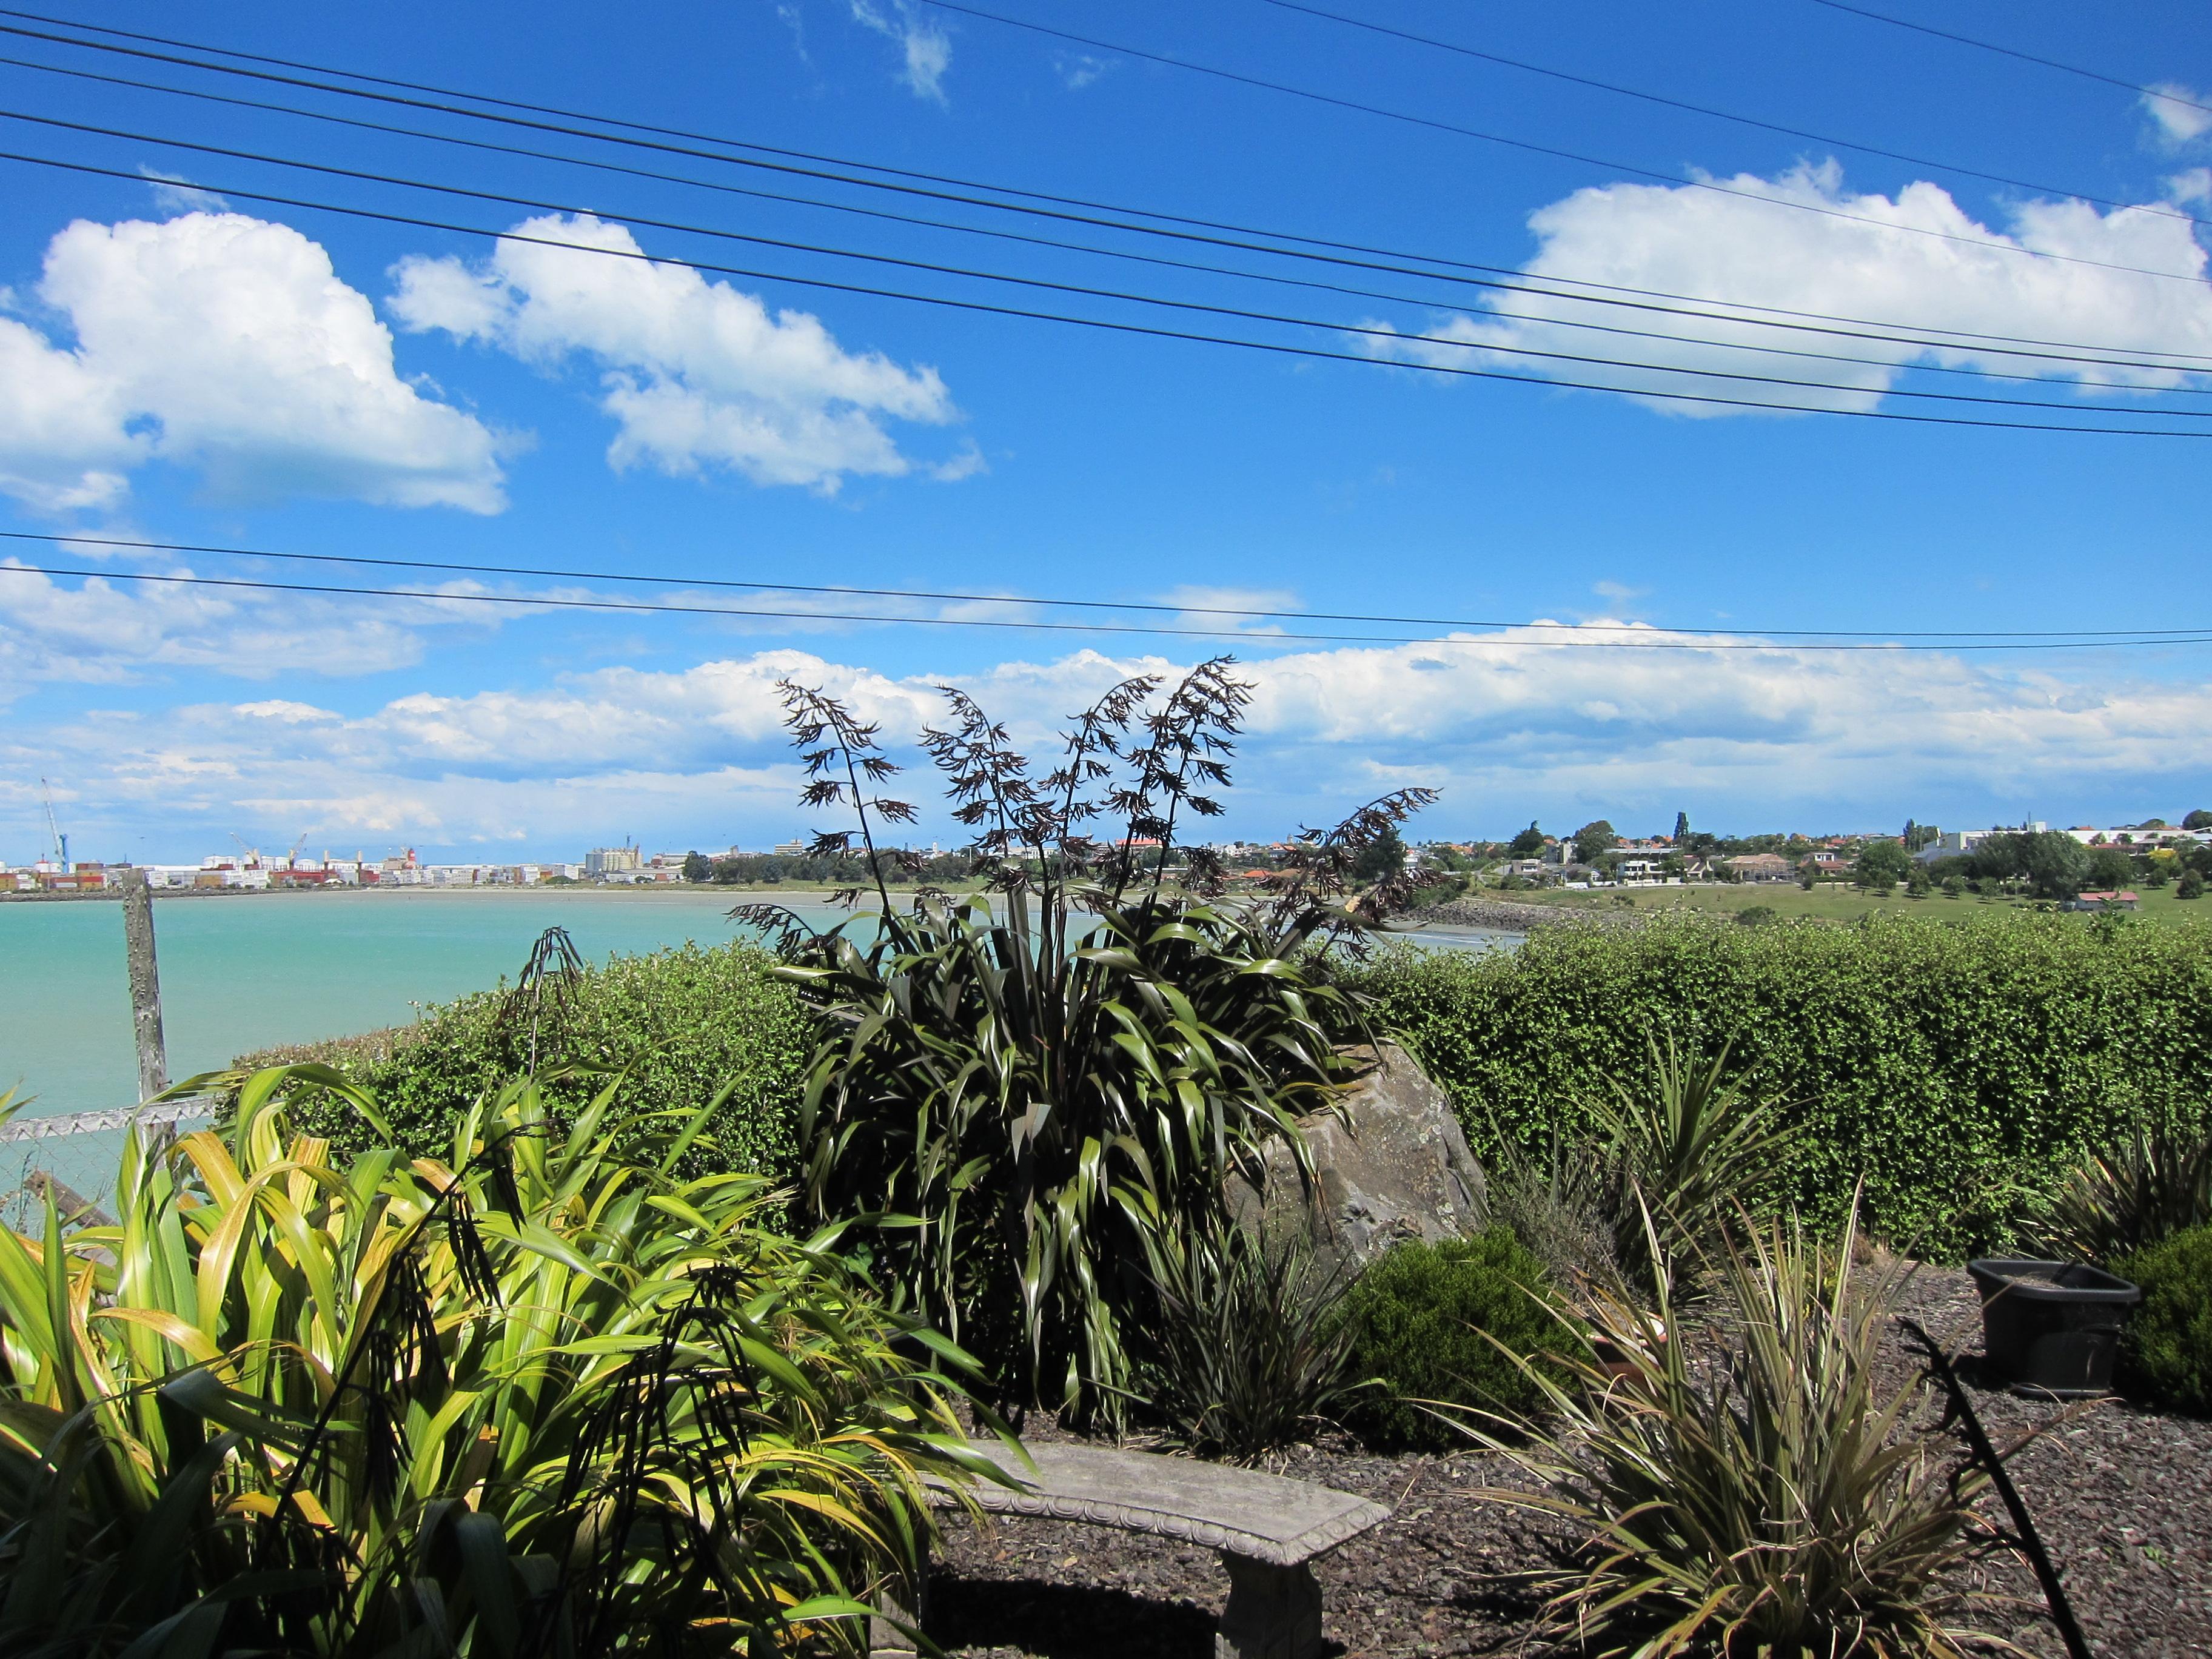 Timaru New Zealand  city photos gallery : Timaru, New Zealand | You Make Me Swoon